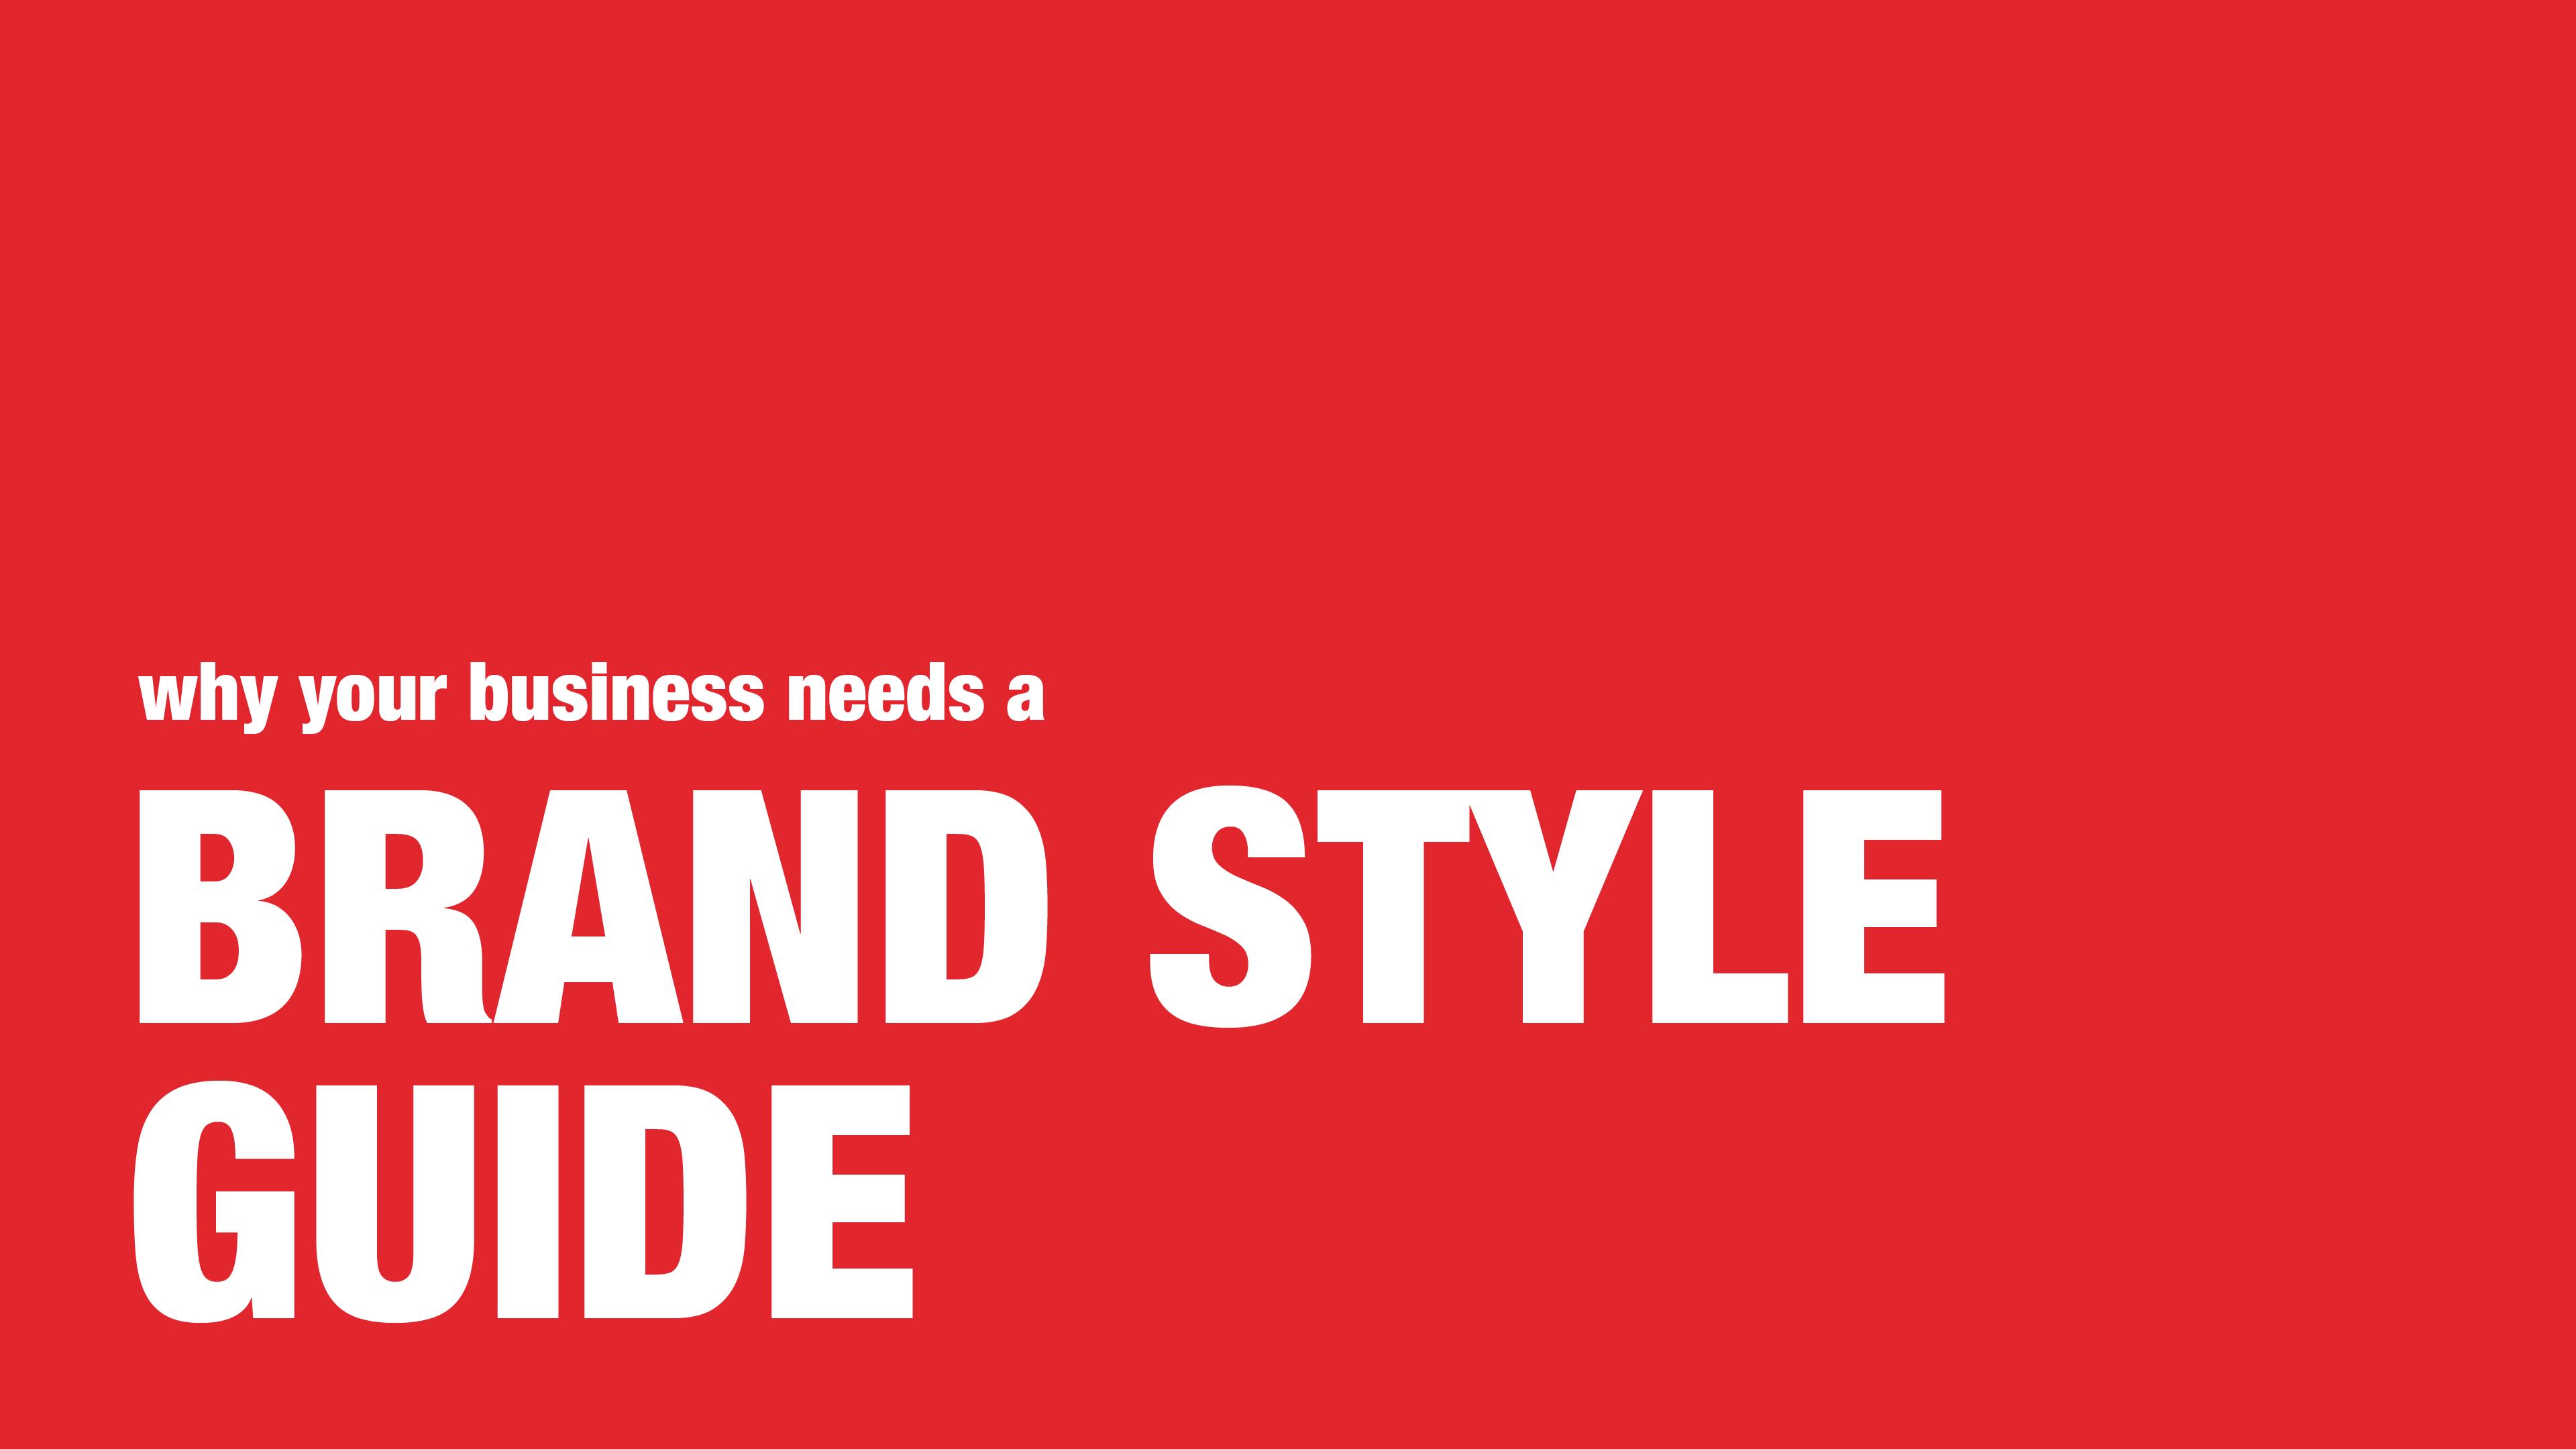 Manraj Ubhi - Brand style guide